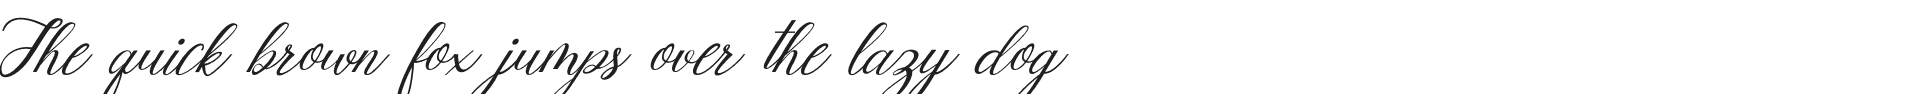 Mottingham-Elegant-Calligraphy.otf